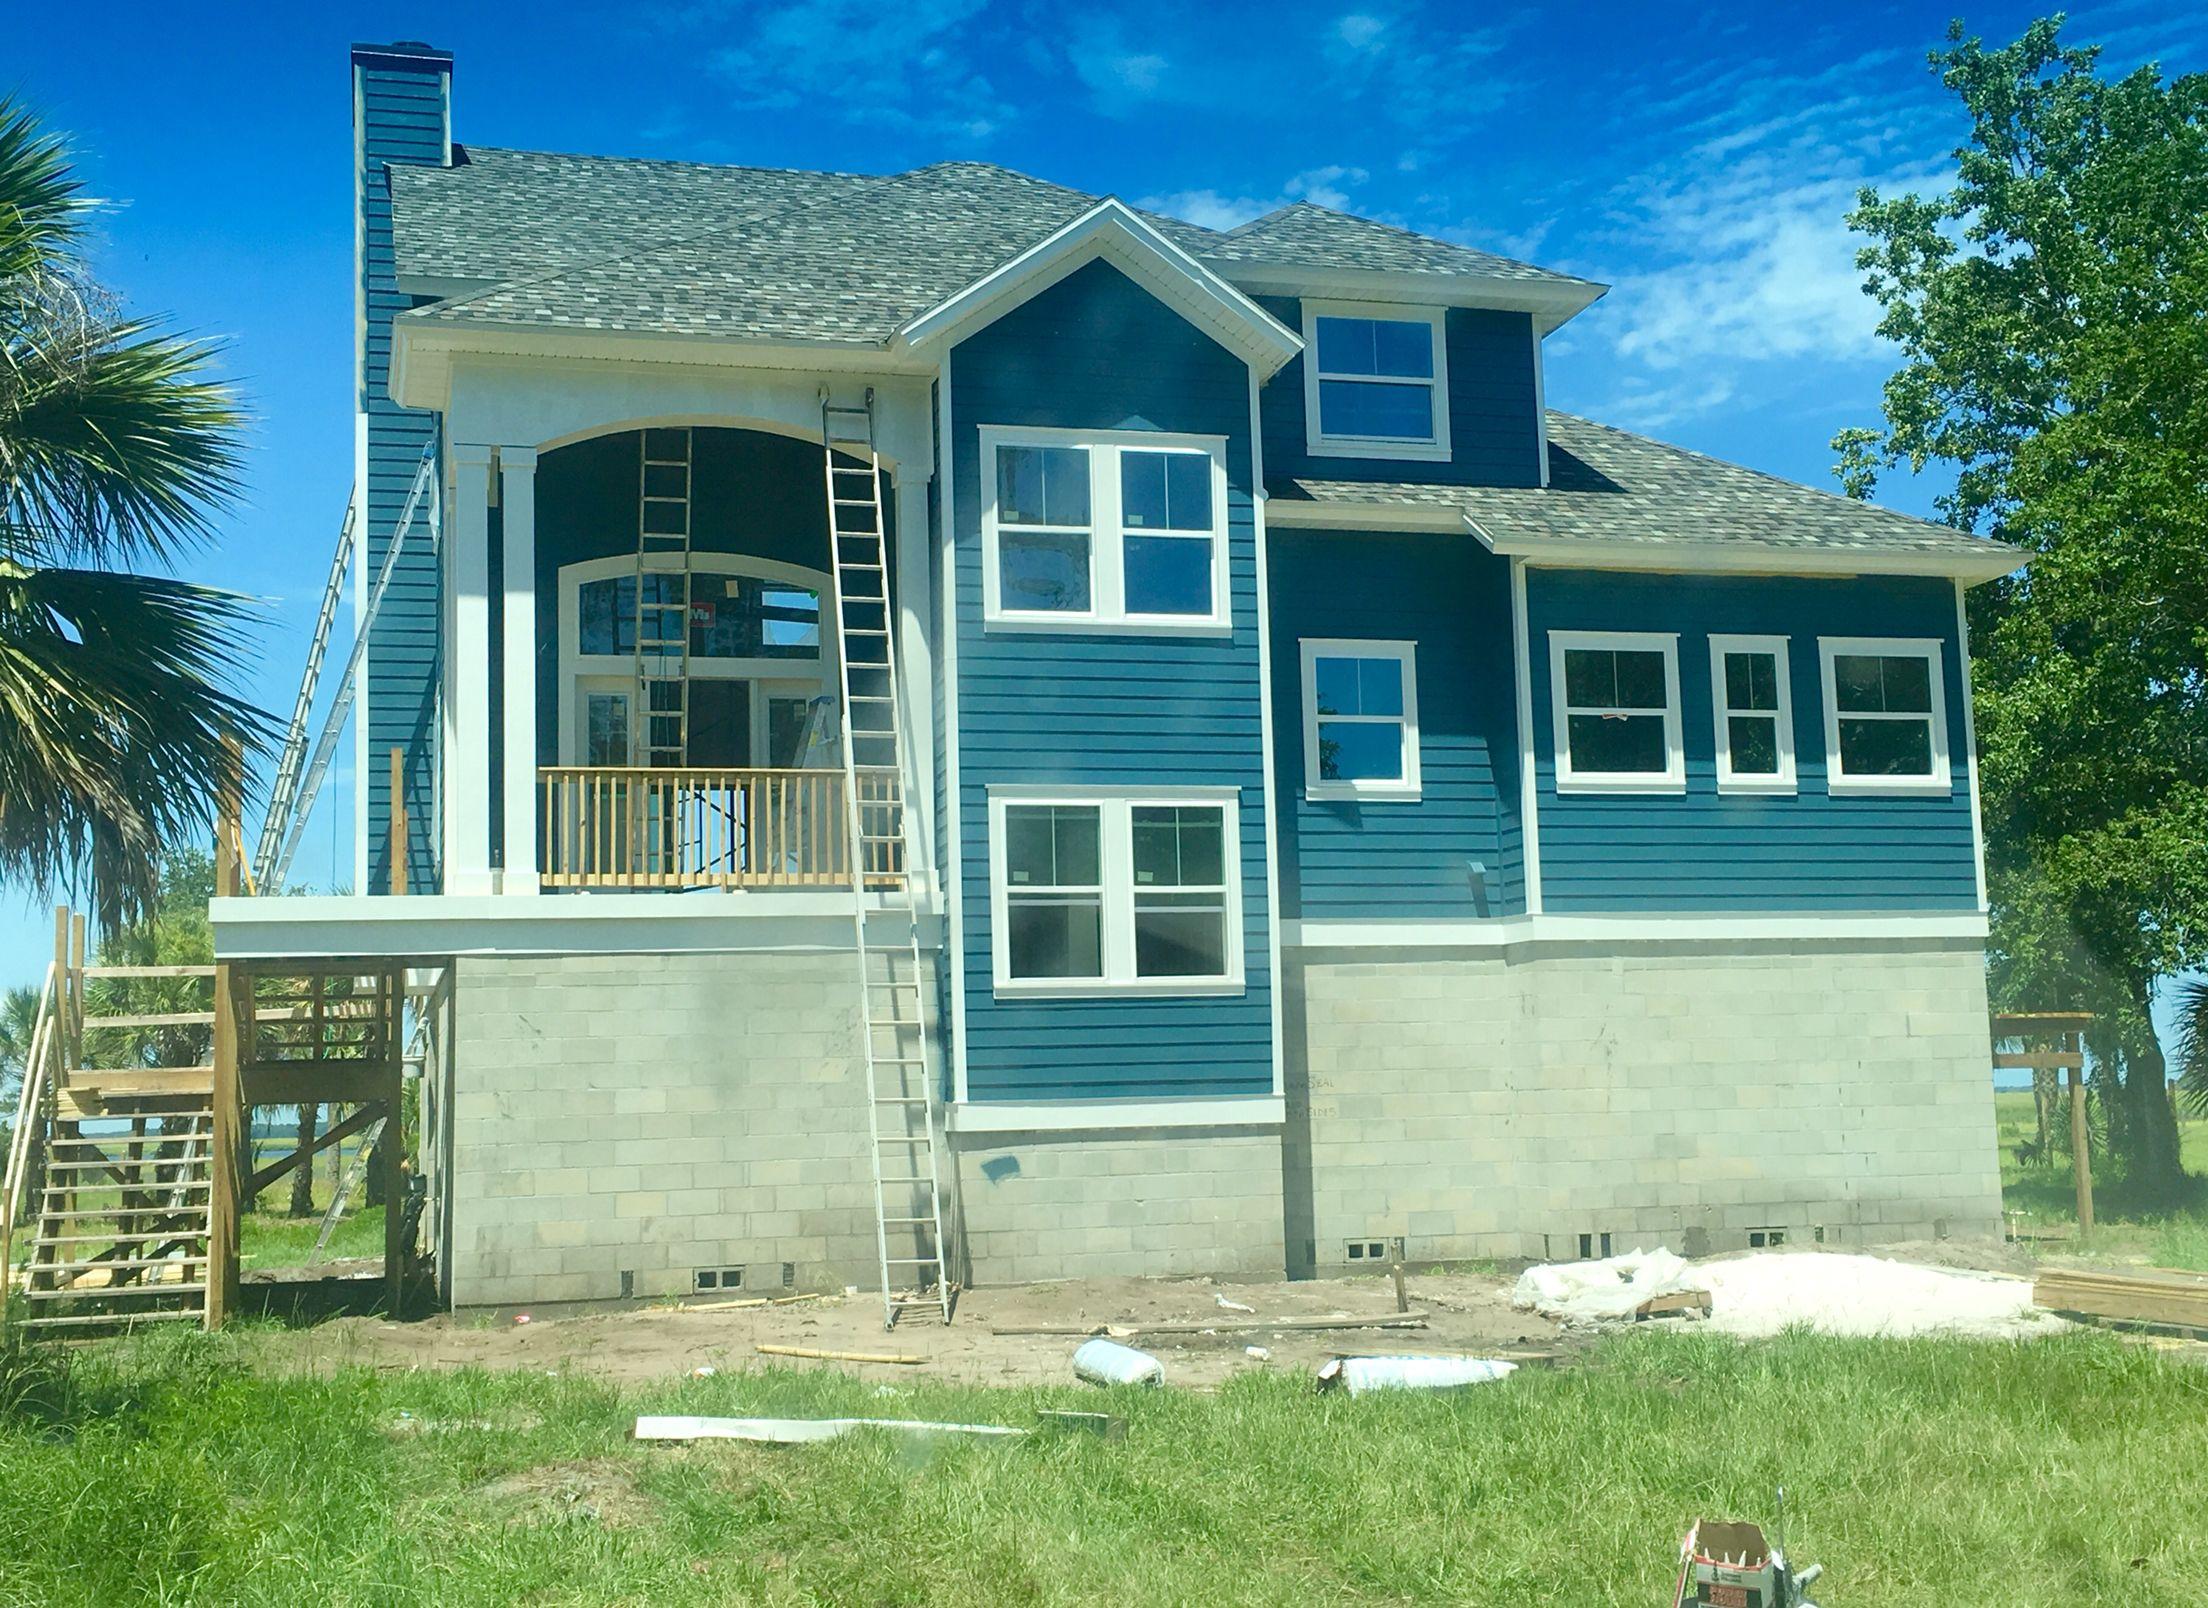 Sherwin williams basket beige exterior - Sherwin Williams Sw Bunglehouse Blue Country Coastal Home